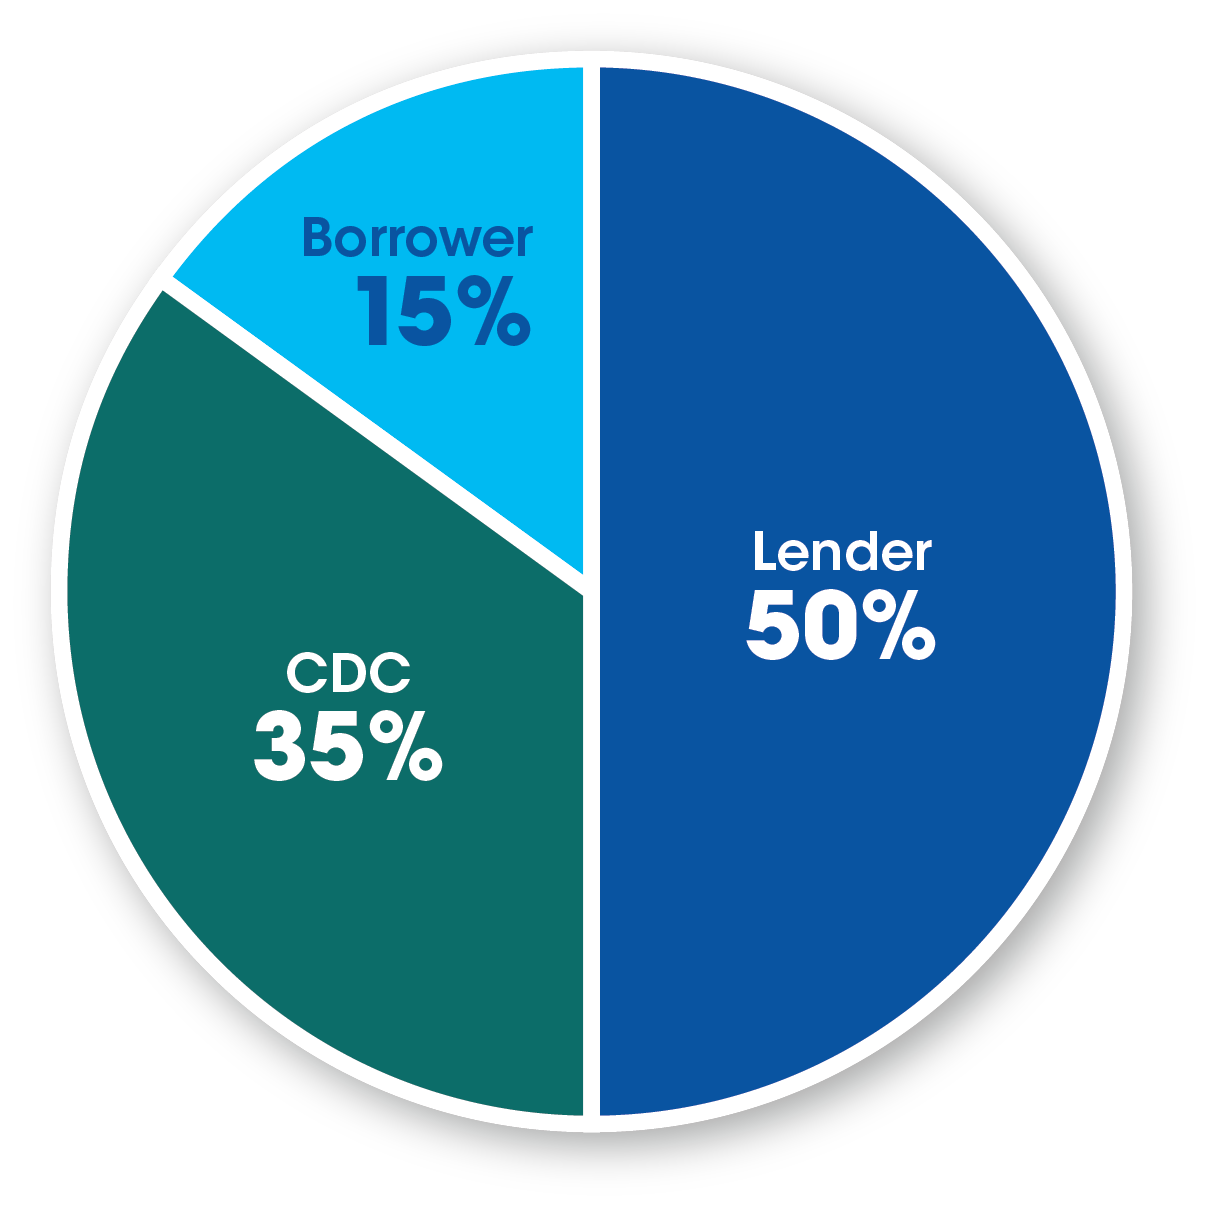 Lender 50%, CDC 35%, Borrower 15%